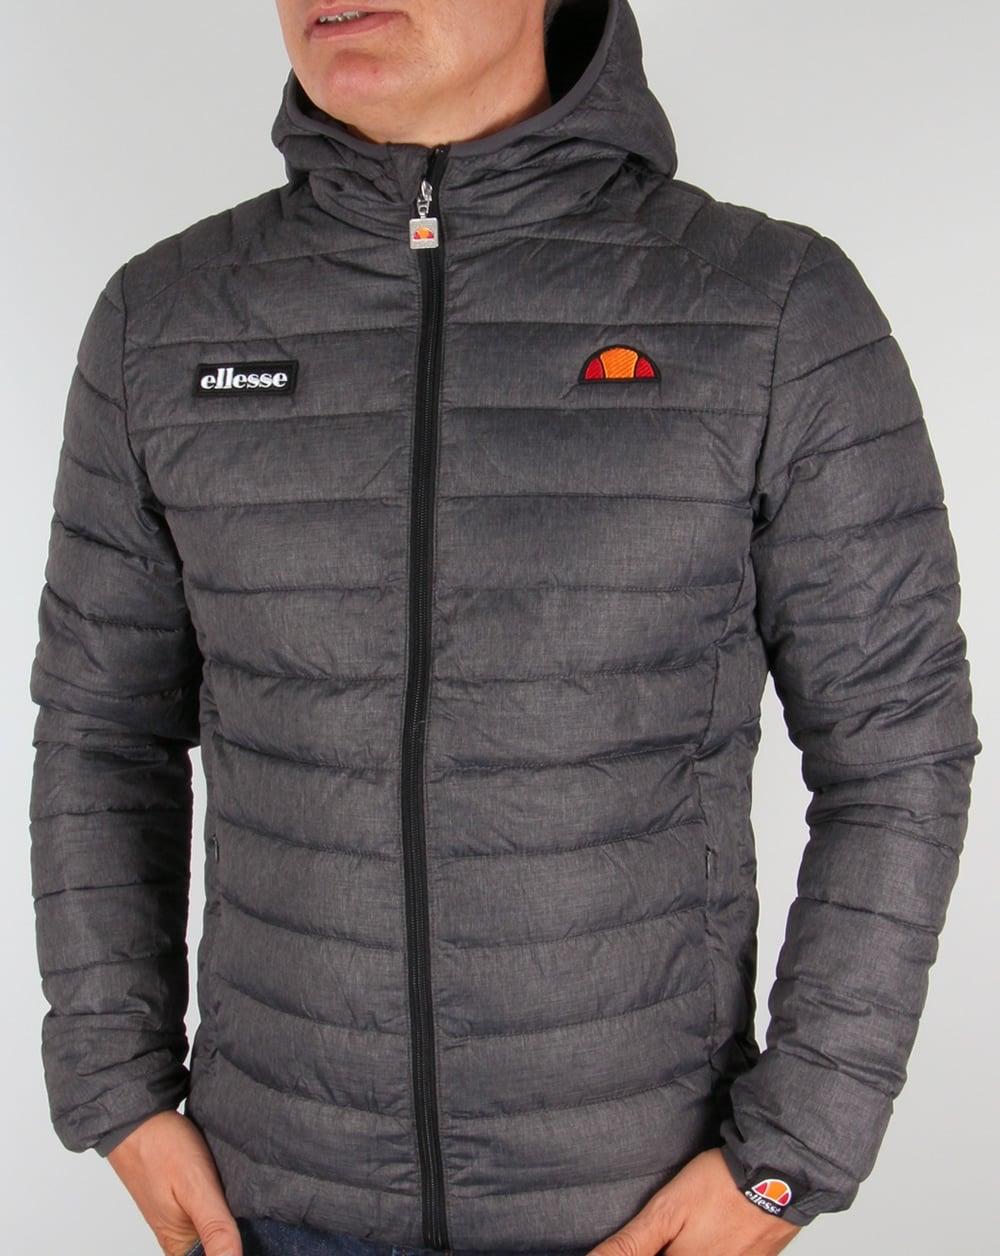 ellesse lombardy jacket grey bubble padded puffer ski coat mens. Black Bedroom Furniture Sets. Home Design Ideas